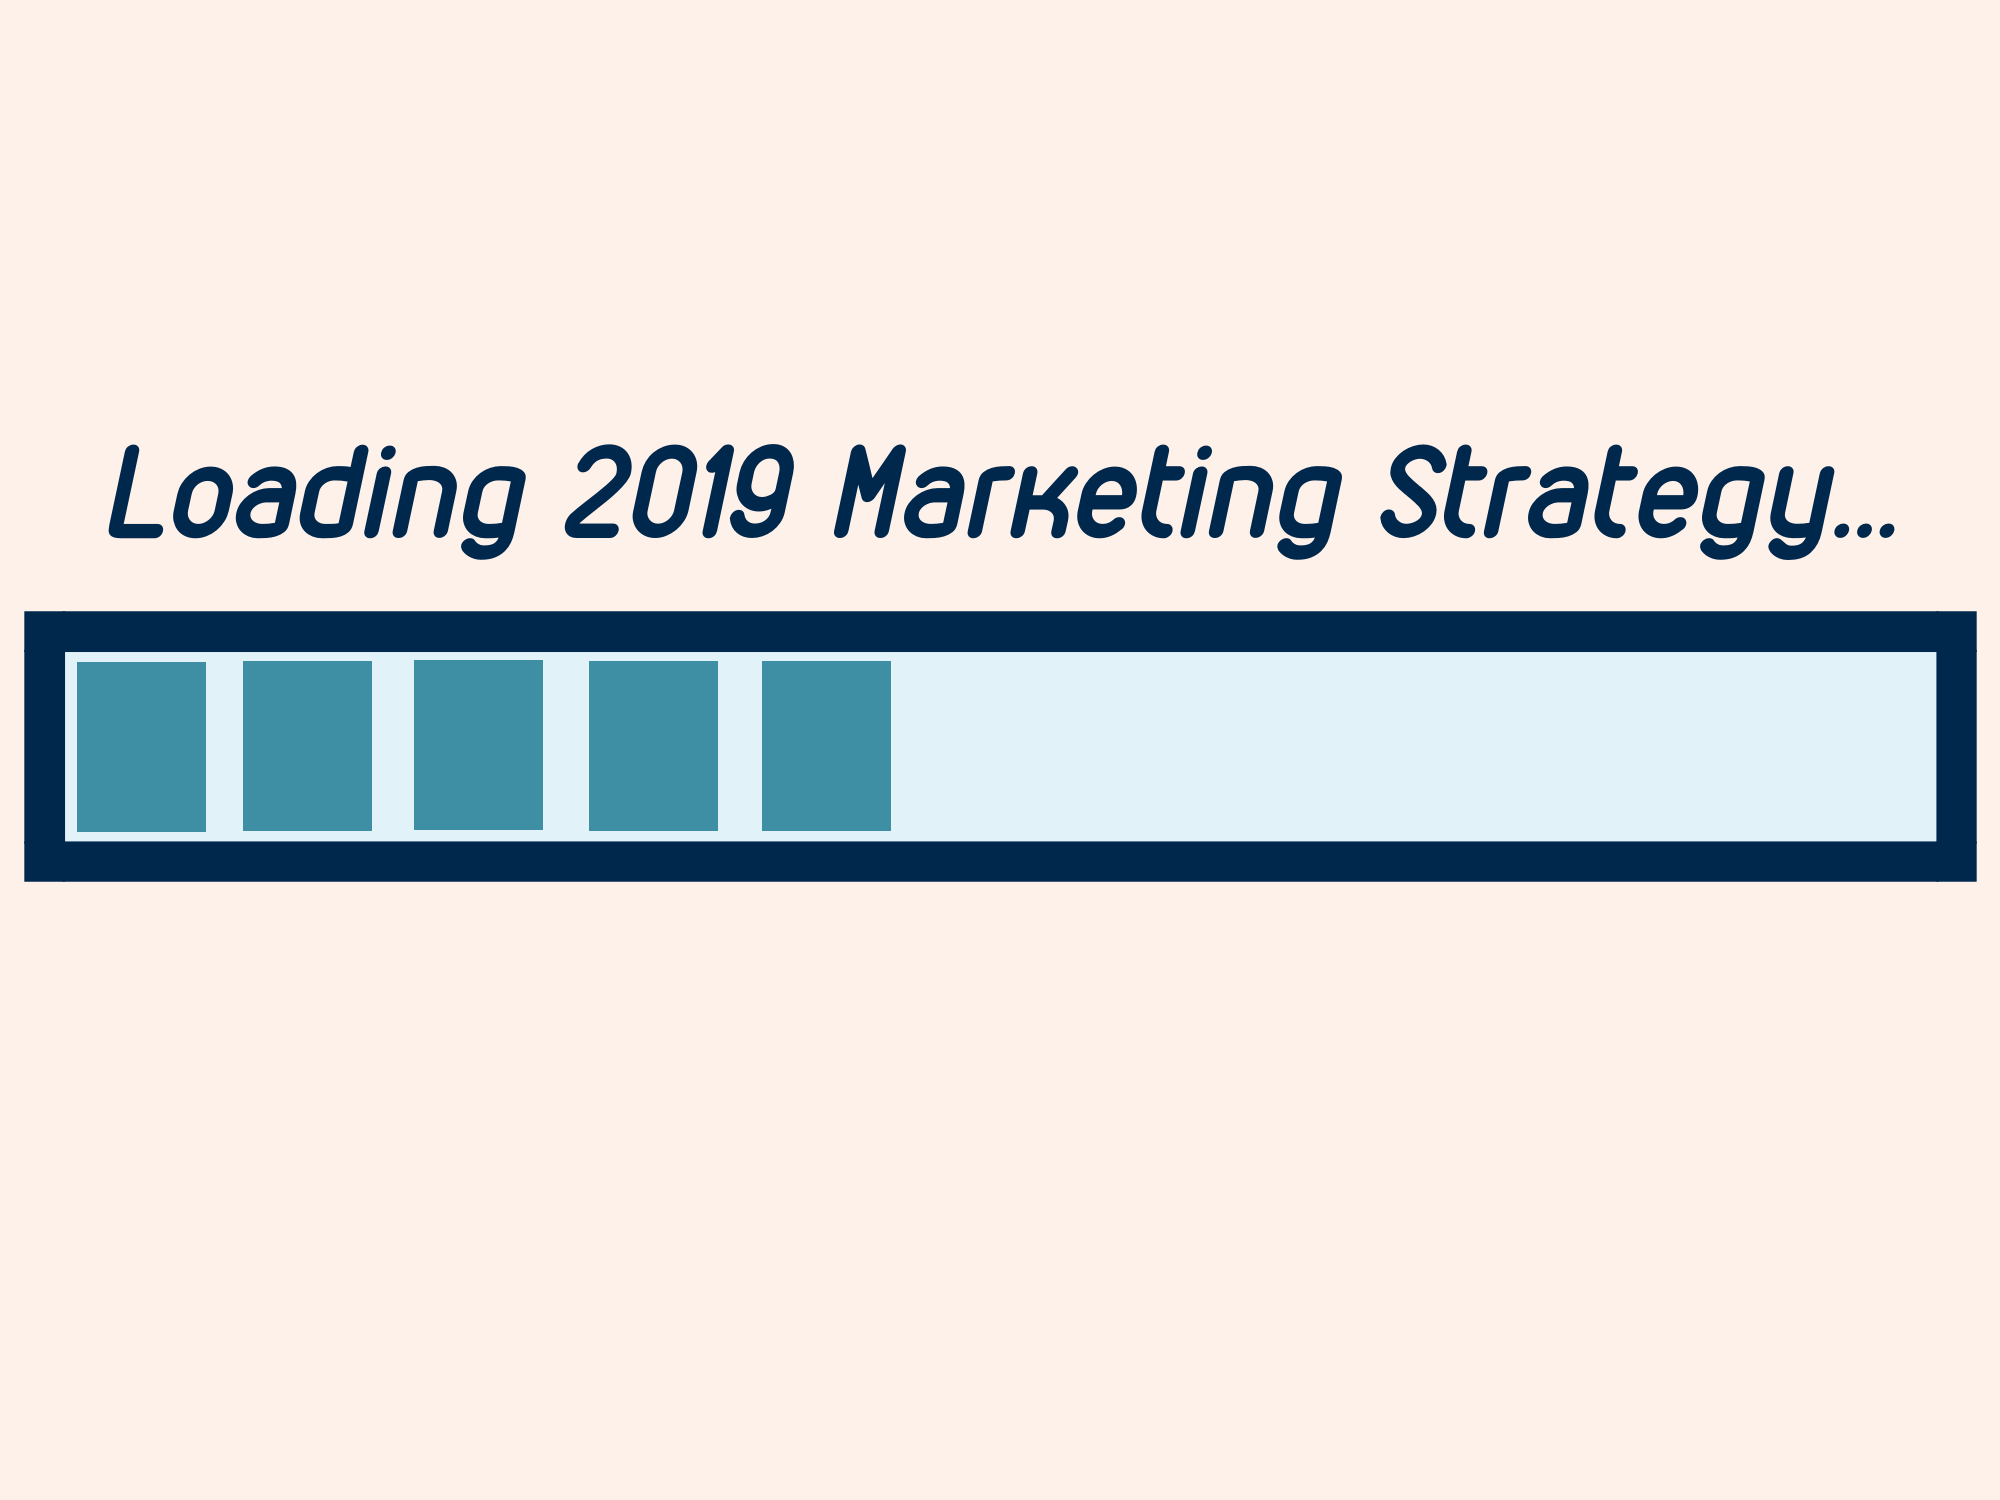 Loading 2019 Marketing Strategy